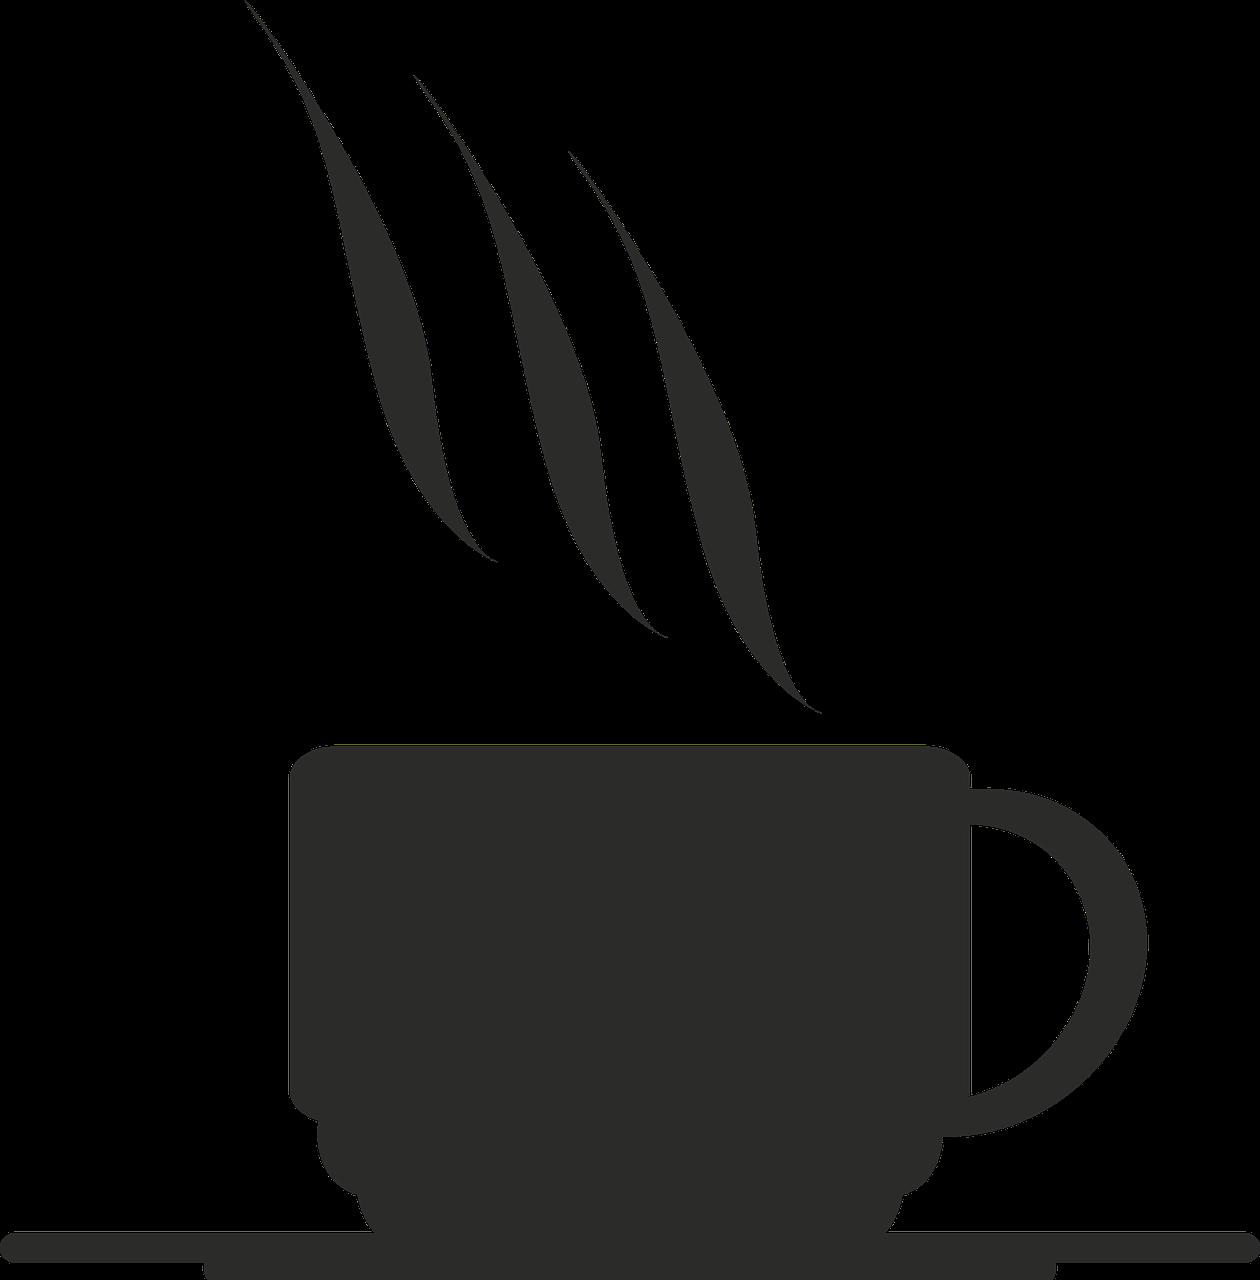 Cup icon symbol c. Coffee clipart coffee bar